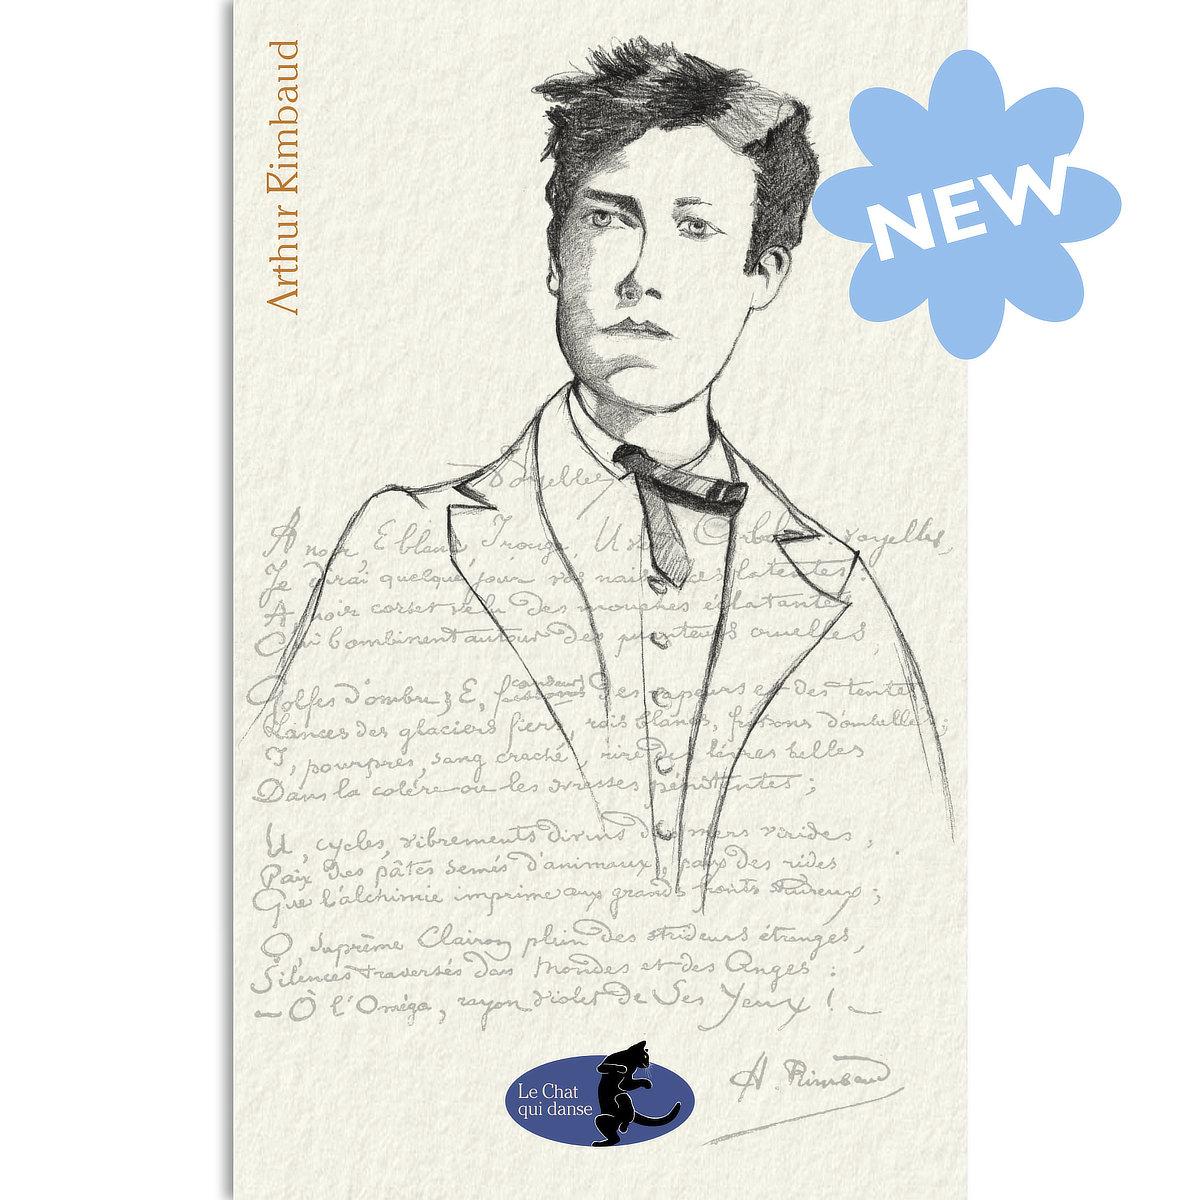 Notebook and sketchbook Arthur Rimbaud.